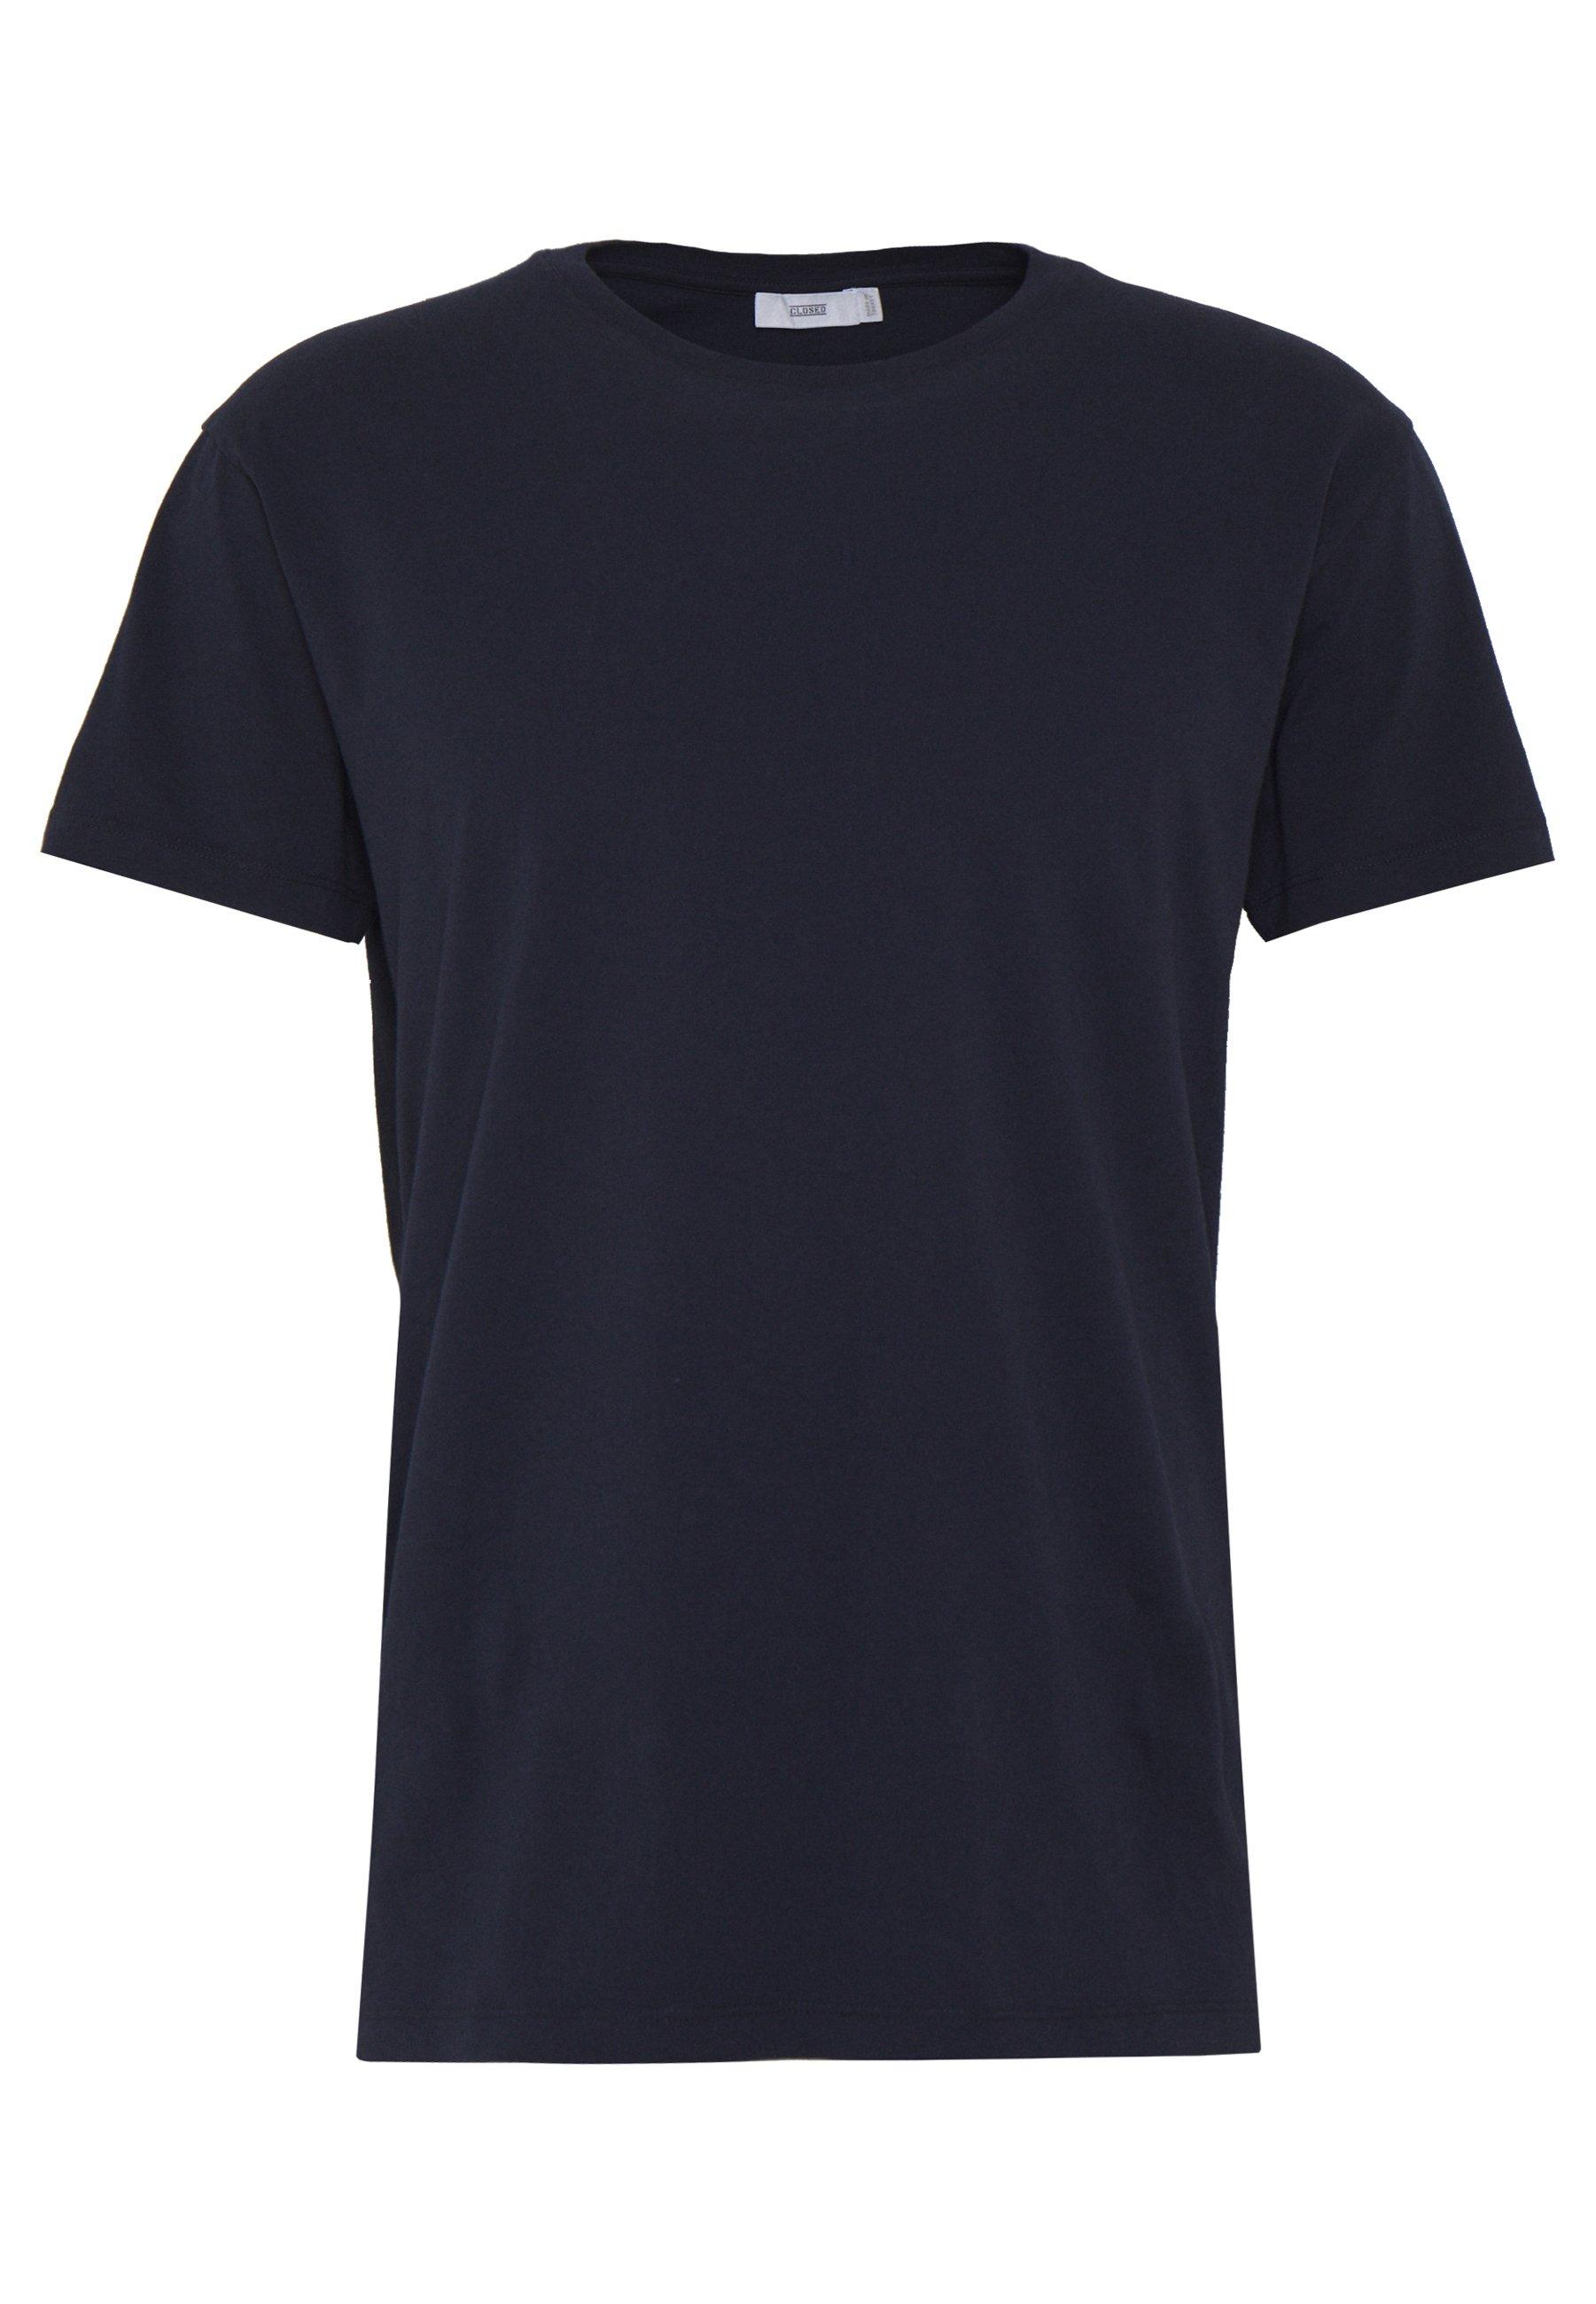 Closed T-shirt - Bas White